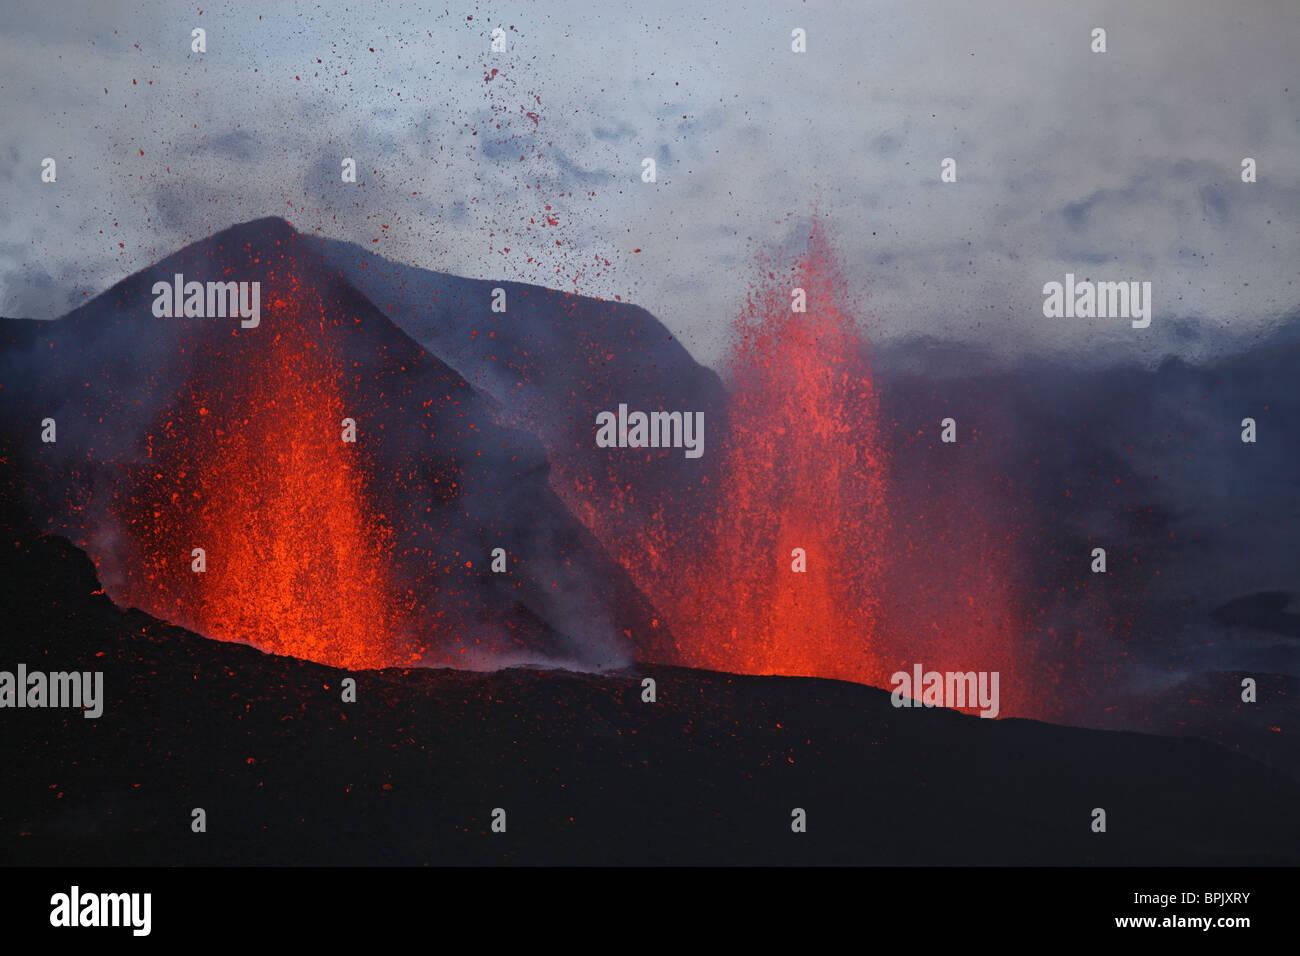 March 25, 2010 - Fimmvörduhals eruption, lava fountains, Eyjafjallajökull, Iceland. - Stock Image